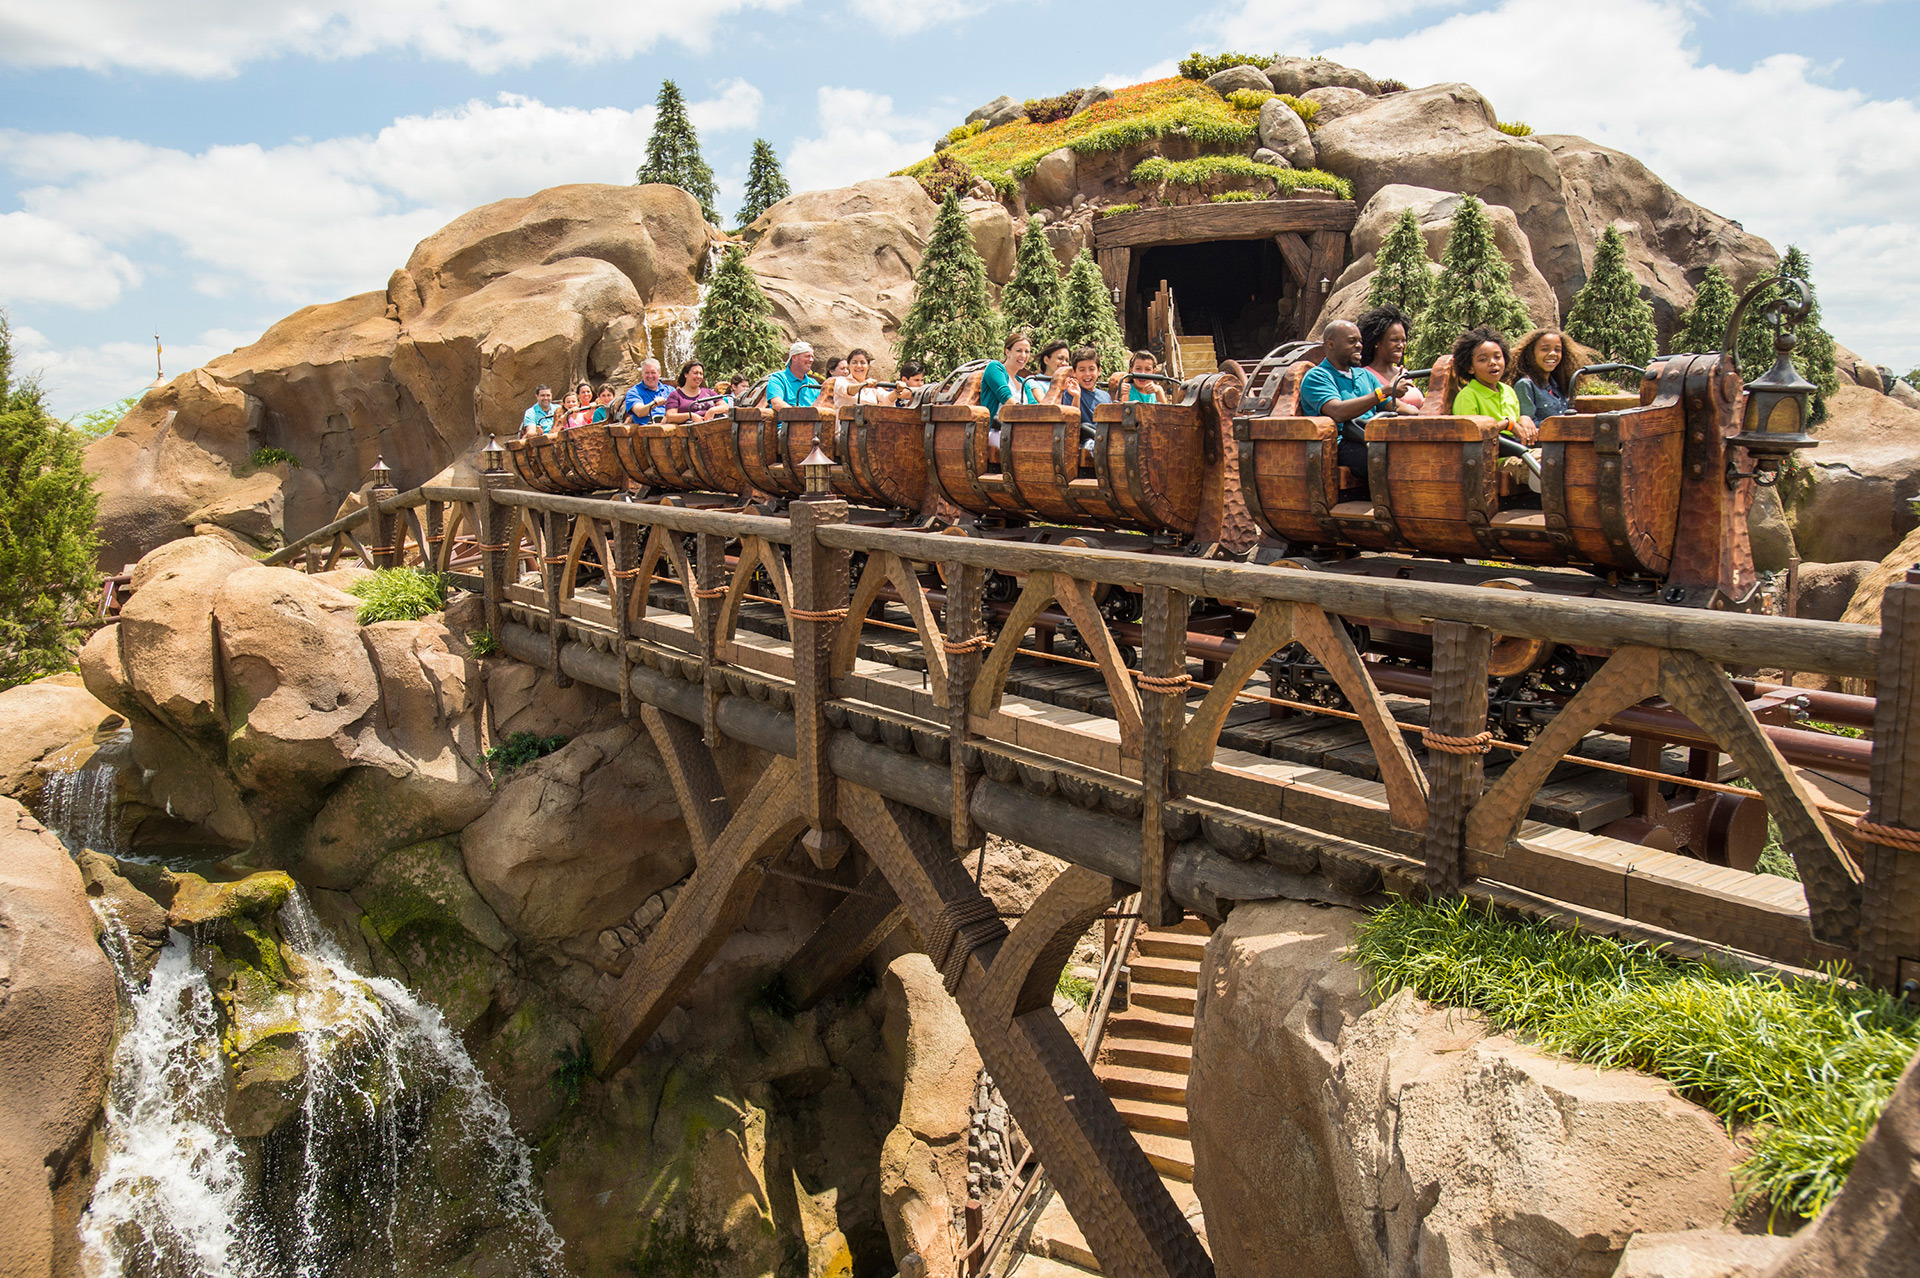 Seven Dwarfs Mine Train in Disney World Florida